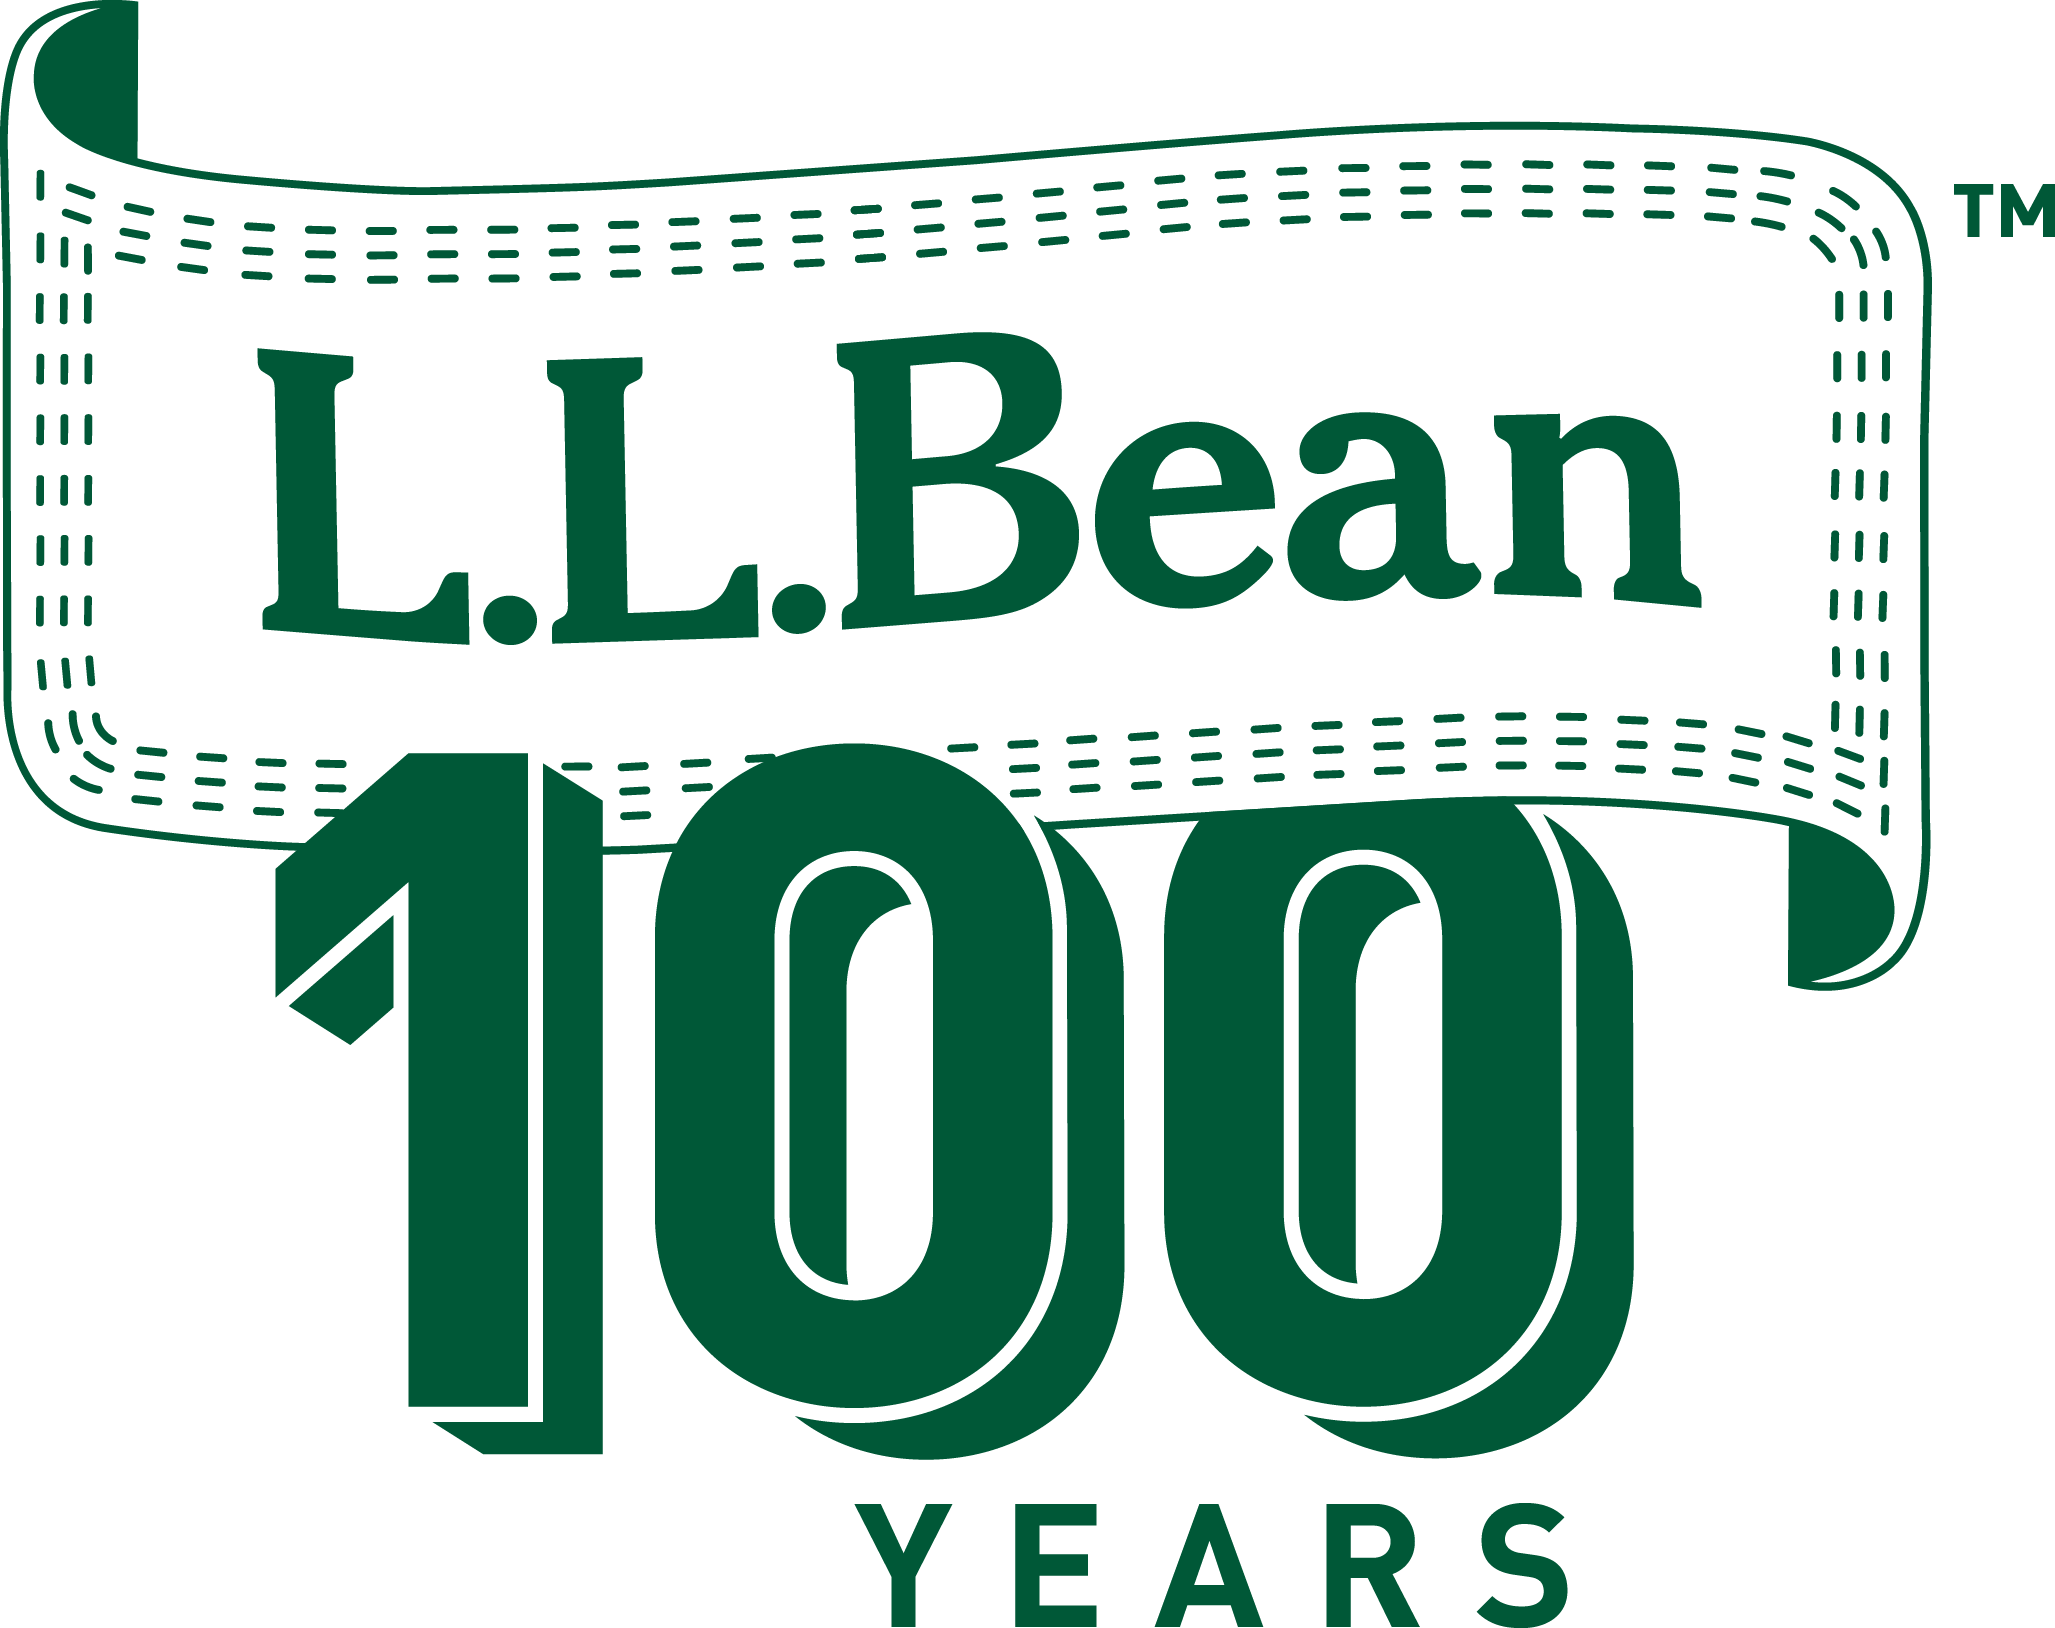 Llbean Wikipedia >> The gallery for --> Inc Centennial Logo